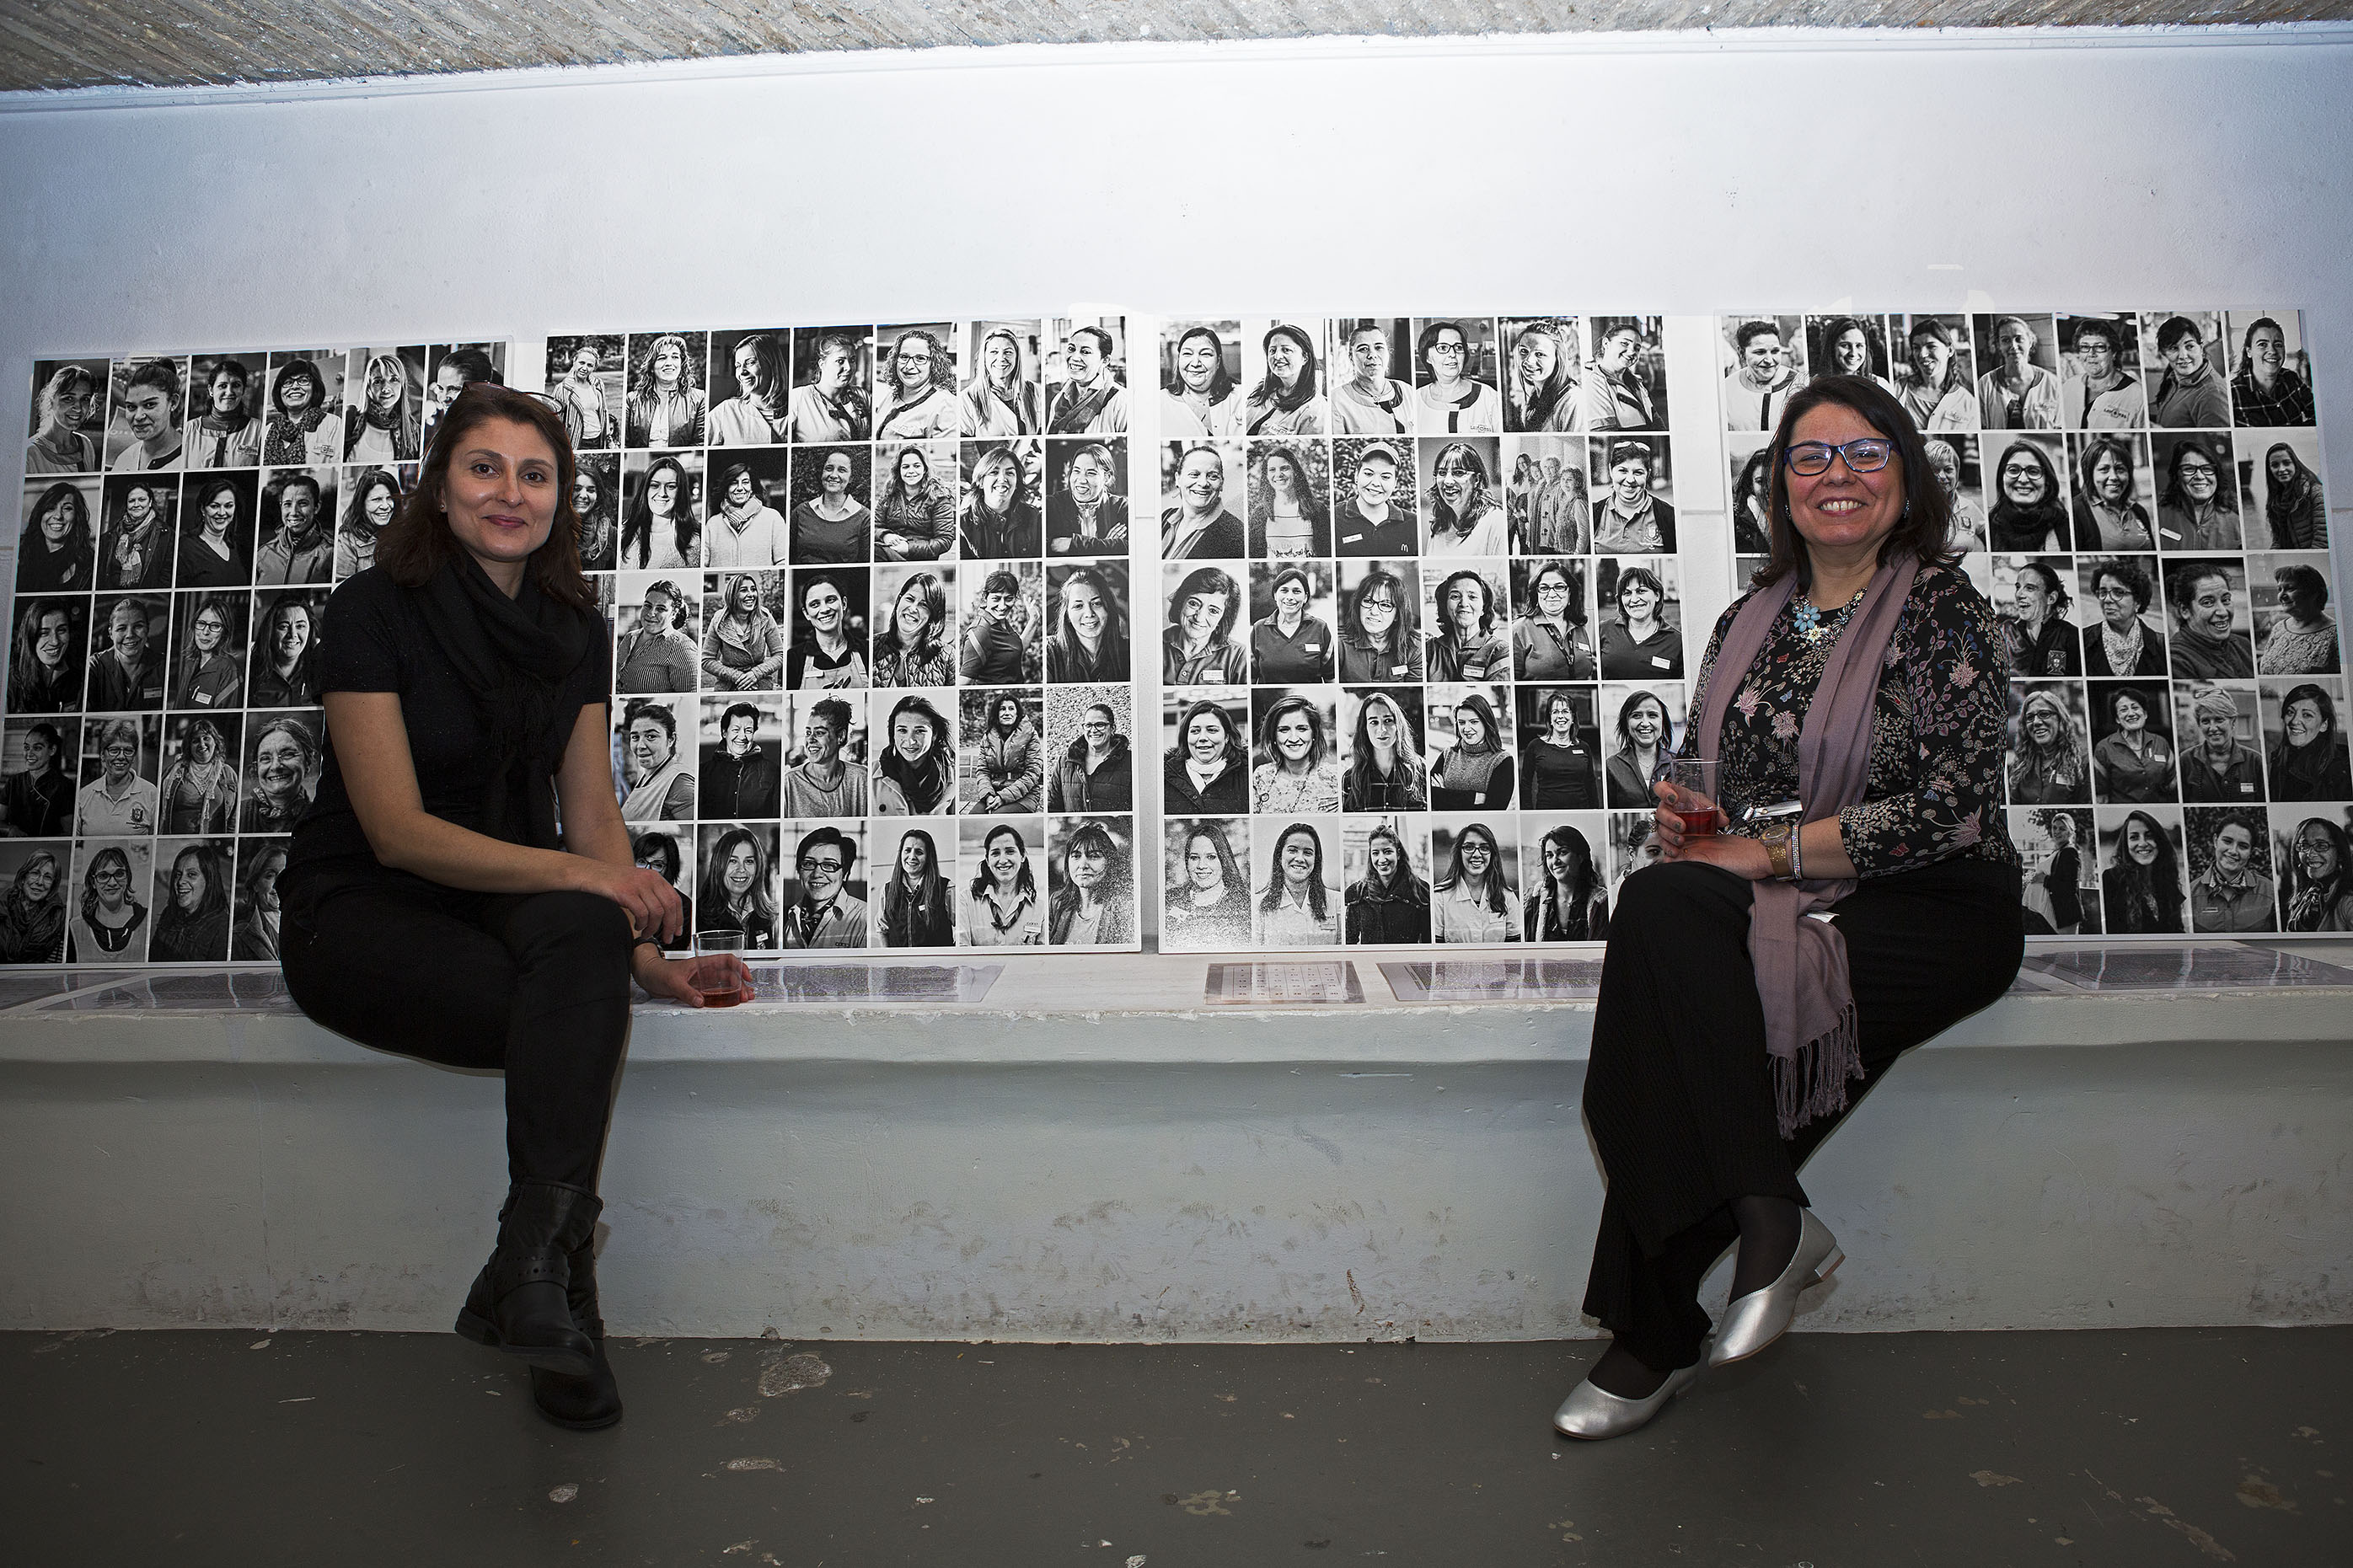 Catarina Antunes et Mariana Mendes posent devant les portraits réalisés par les photographes Nadir Mokdad et Carla da Silva.